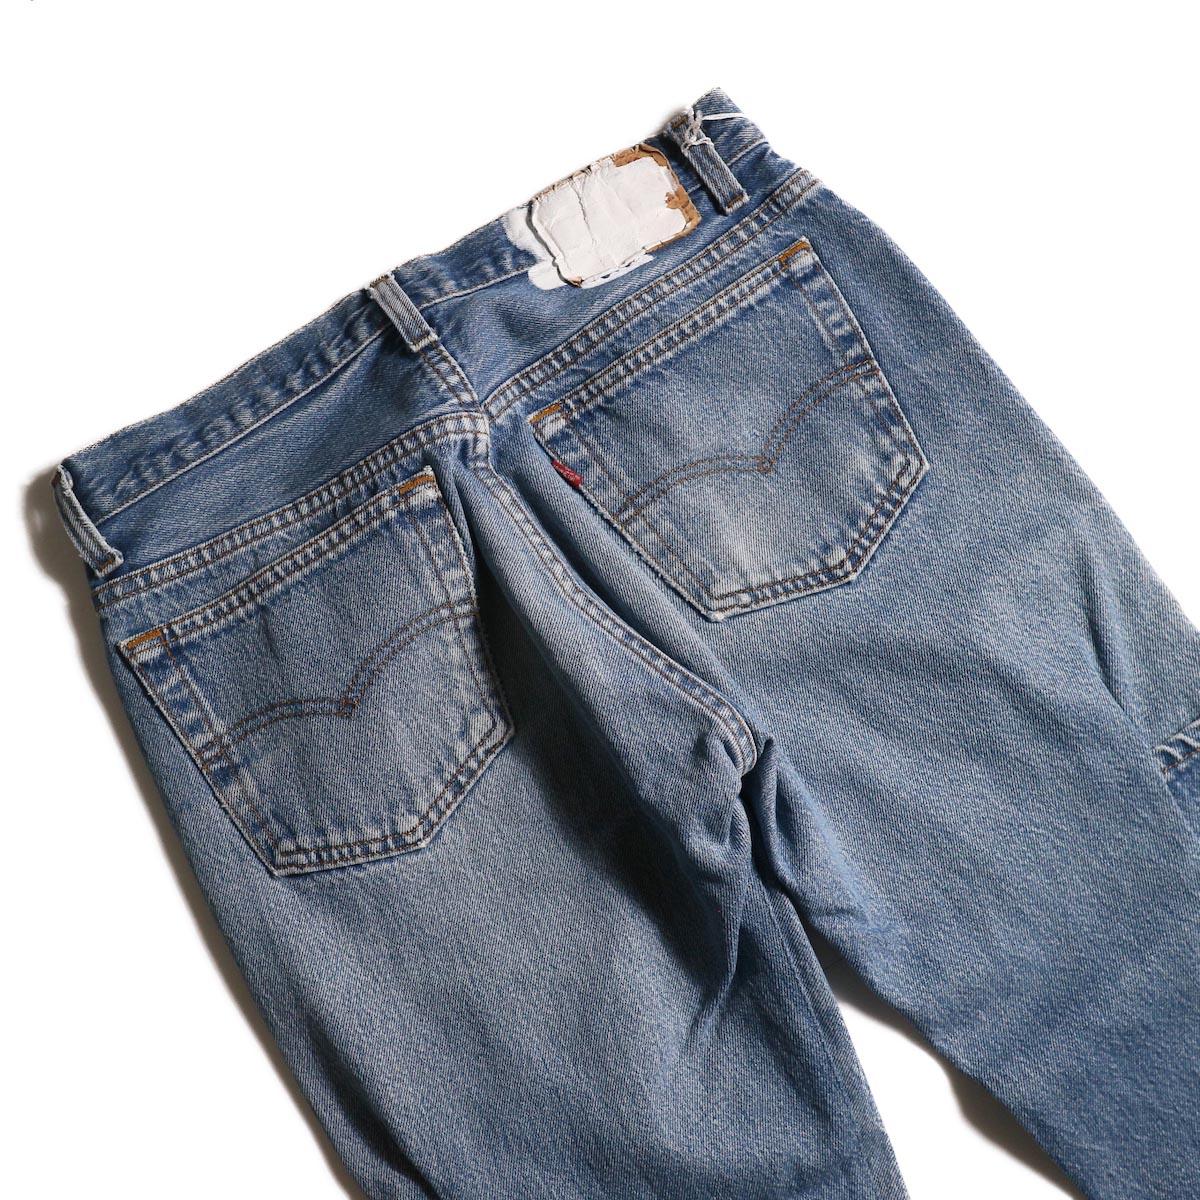 OLD PARK / 7Pocket Jeans -Blue (Msize-A)ヒップポケット